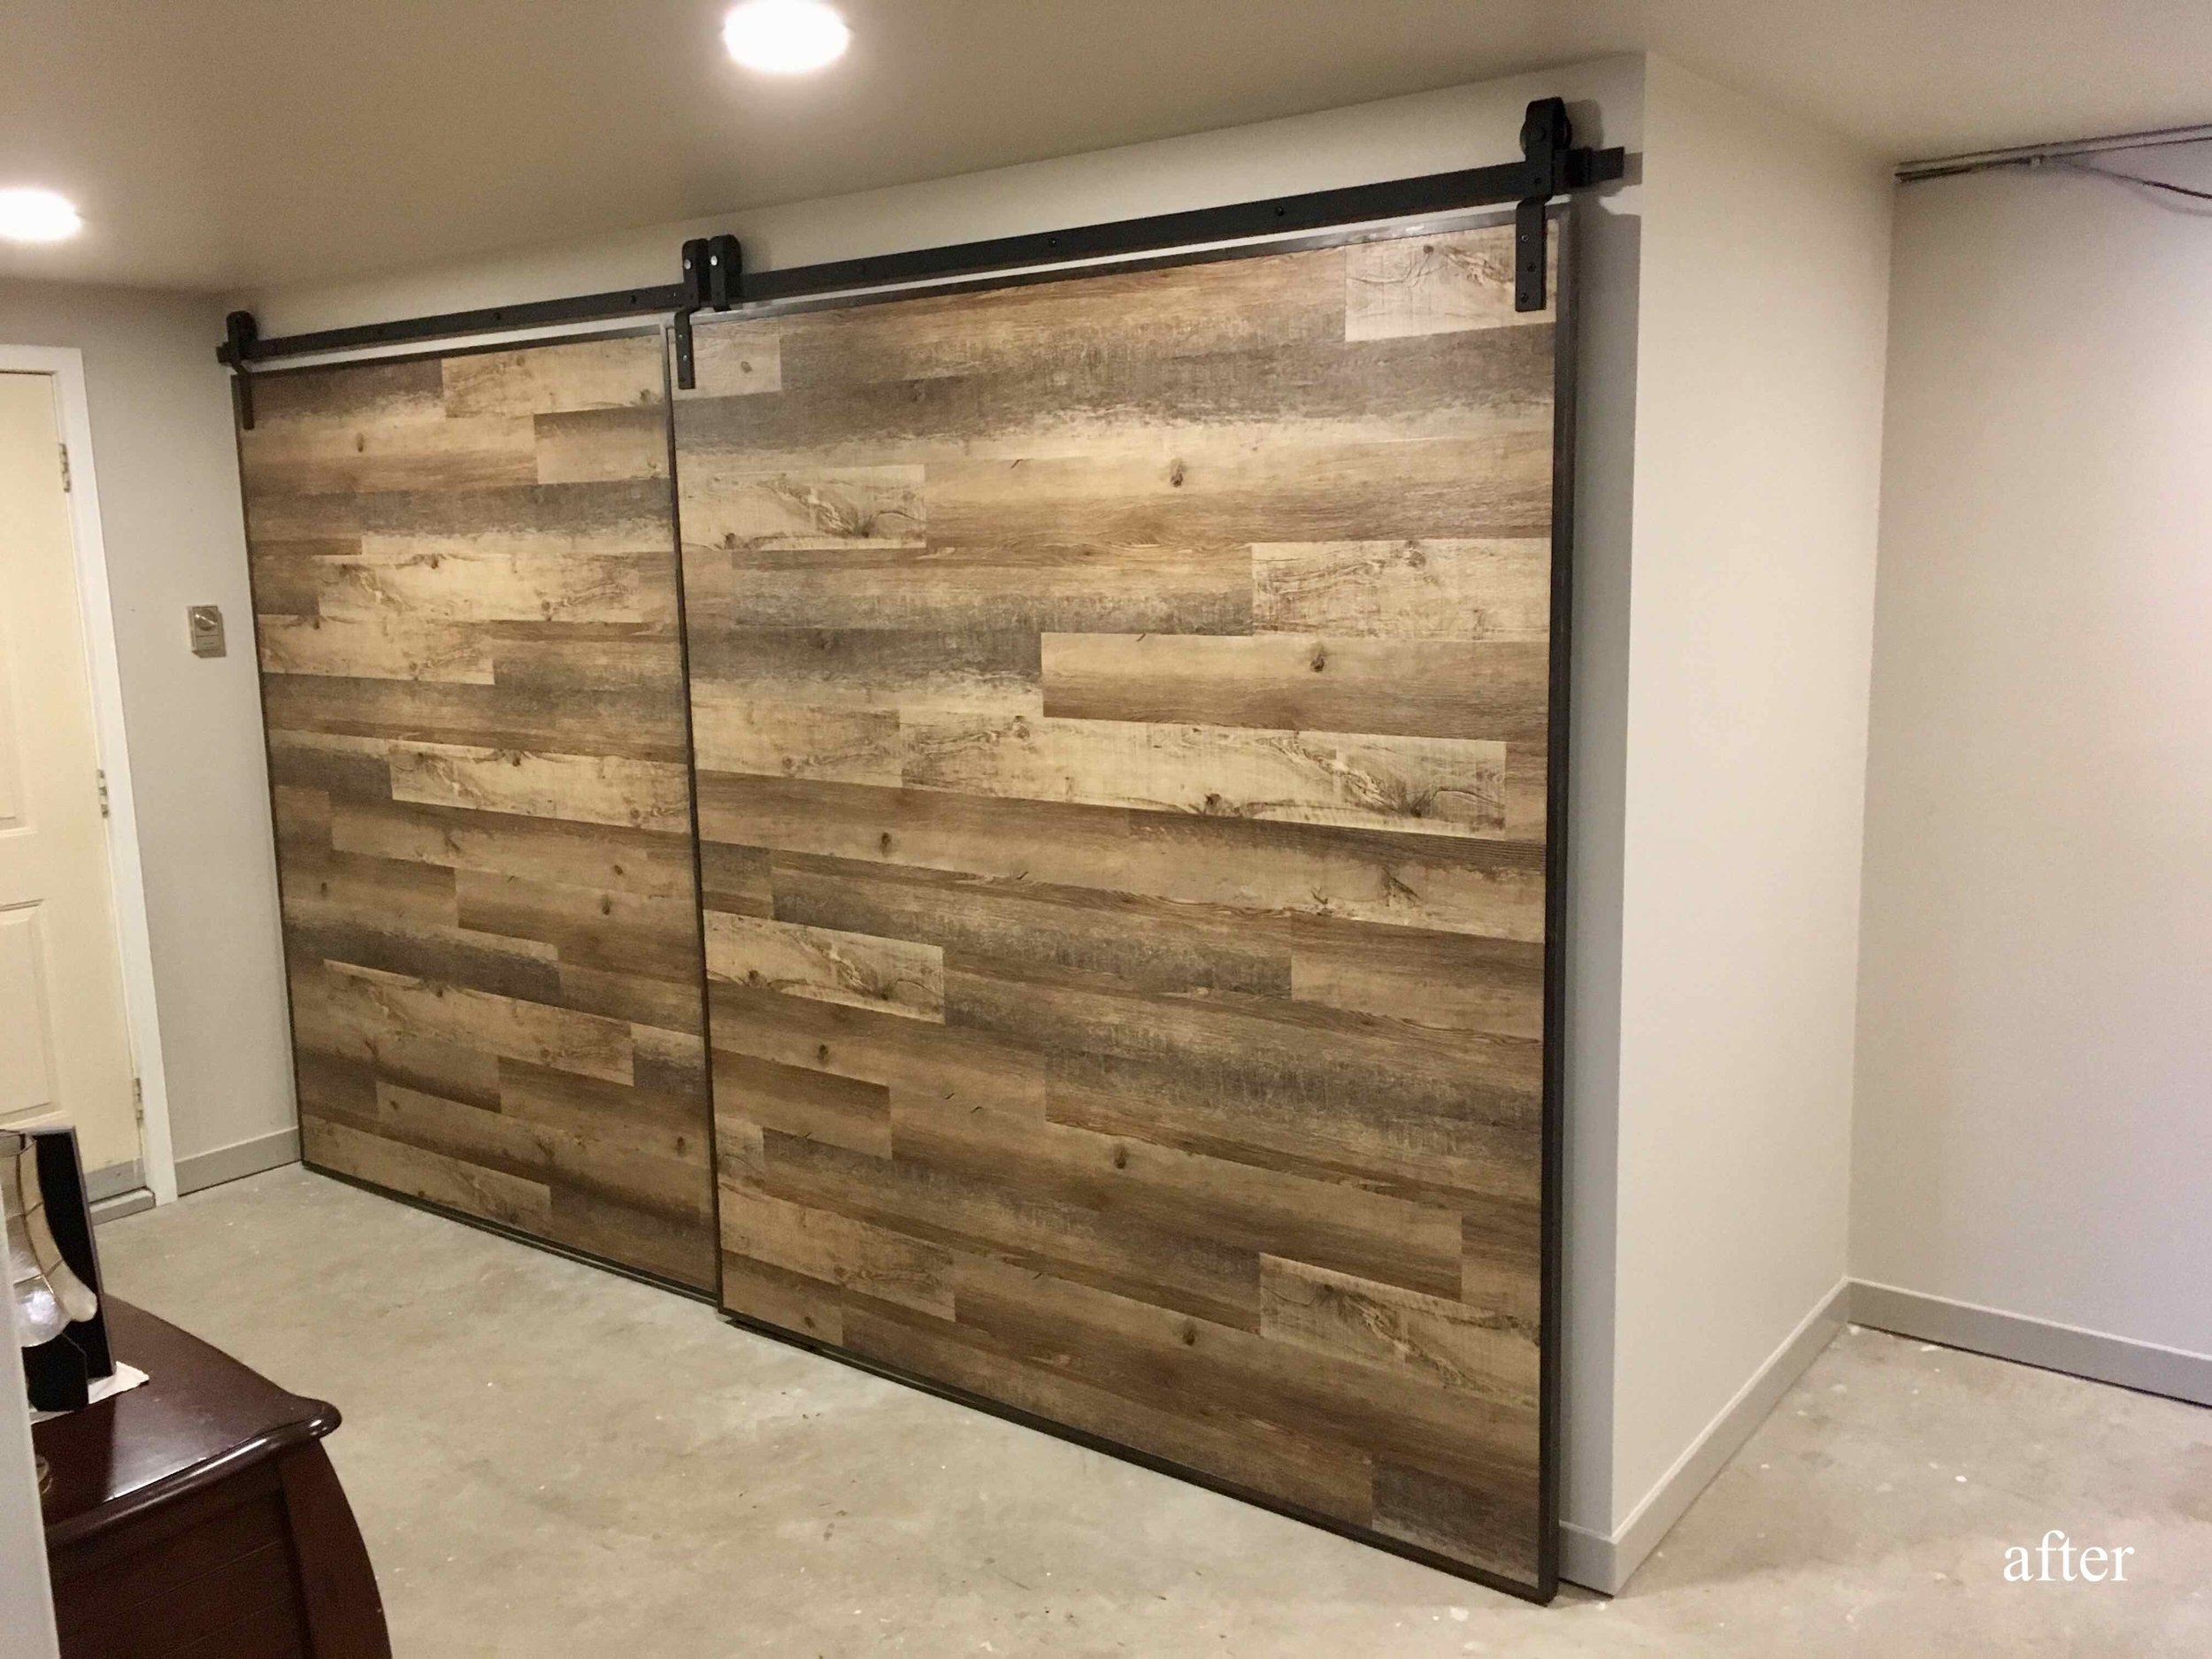 Custom barn doors for a basement storage room in the East Kootenays.